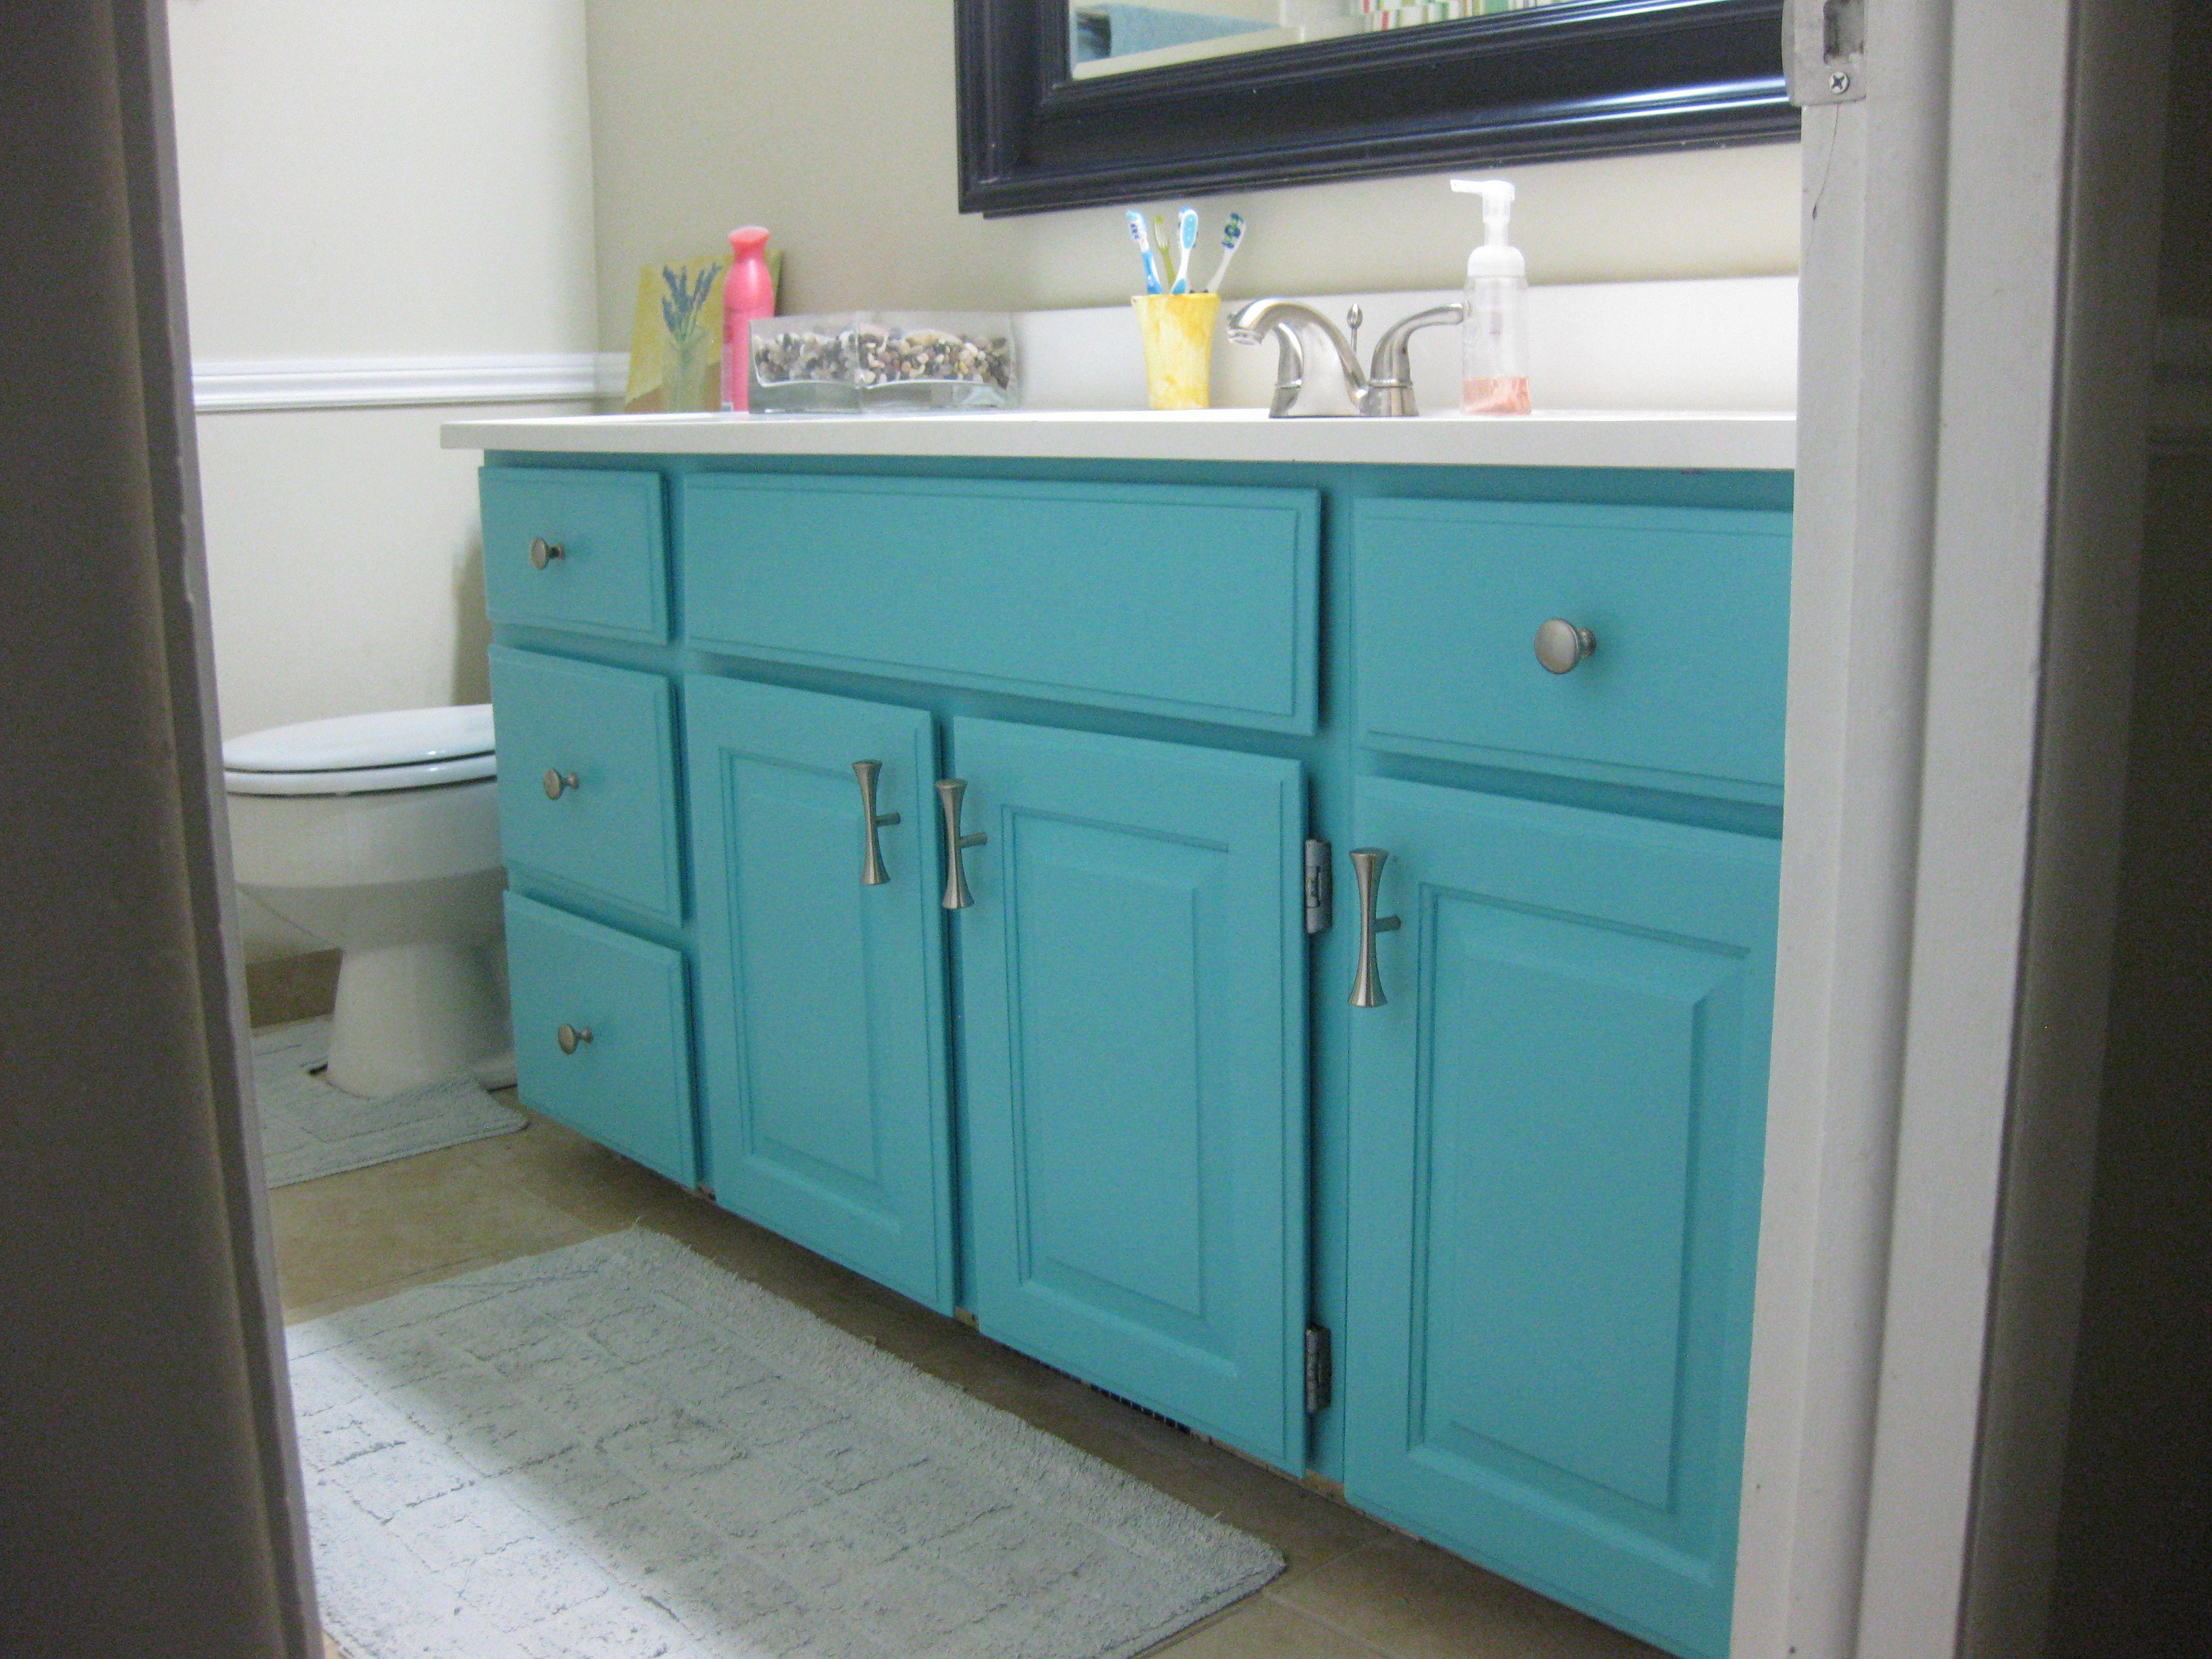 Pin By Jennifer Bateson On My Style Painted Vanity Bathroom Bathroom Vanity Bathroom Furniture Vanity